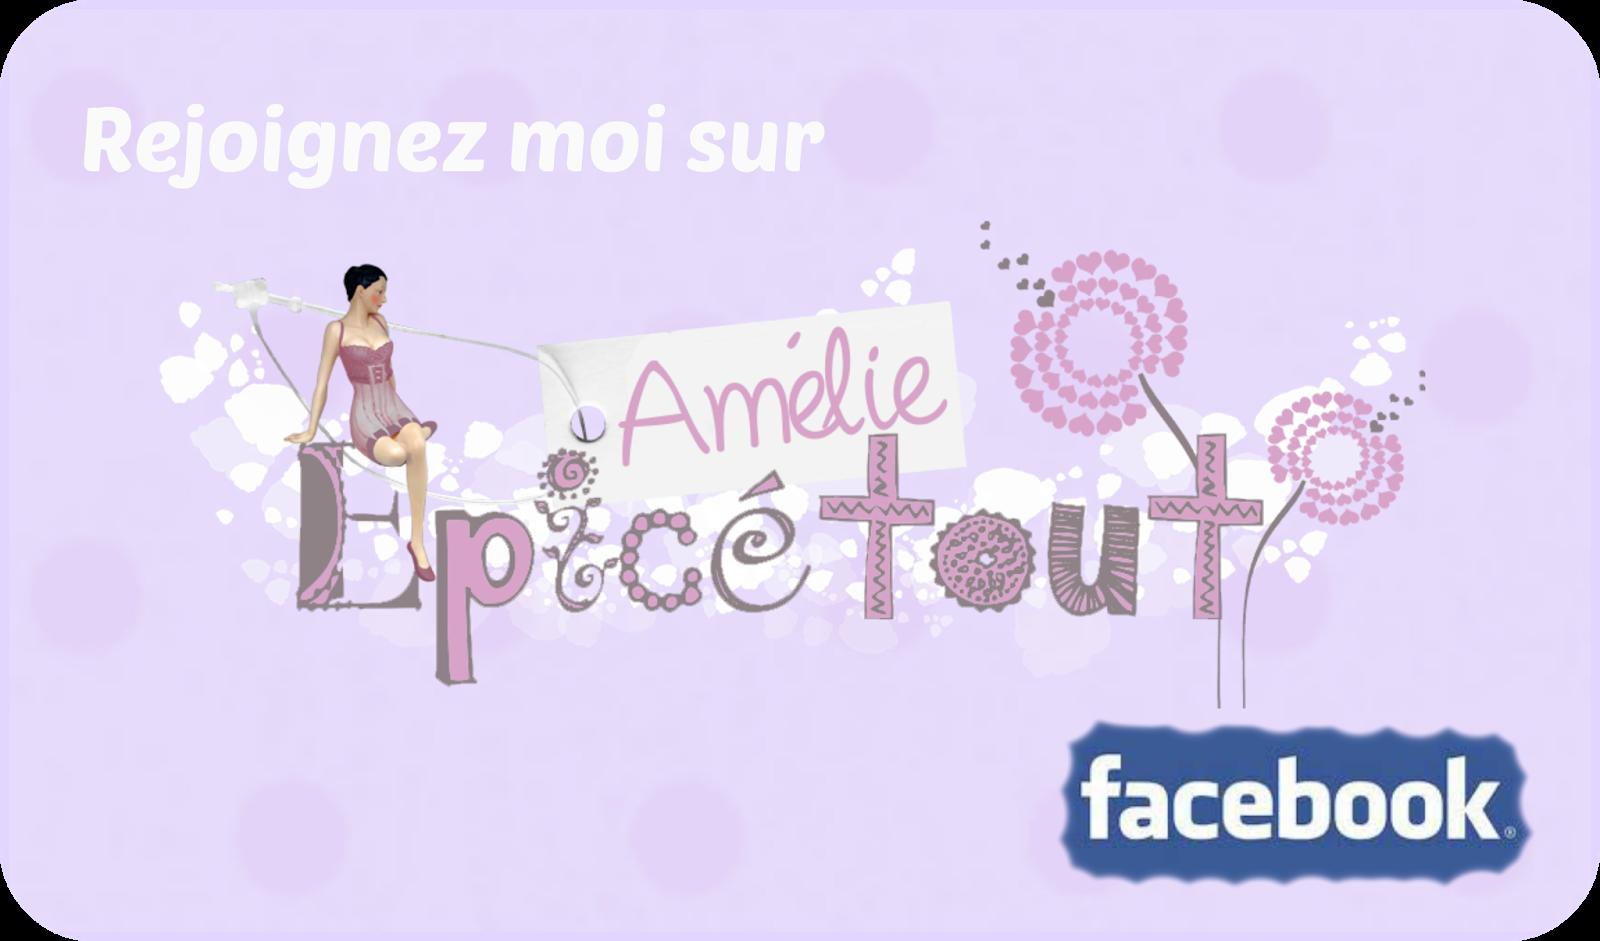 https://www.facebook.com/AmelieEpicetoutLeBlog